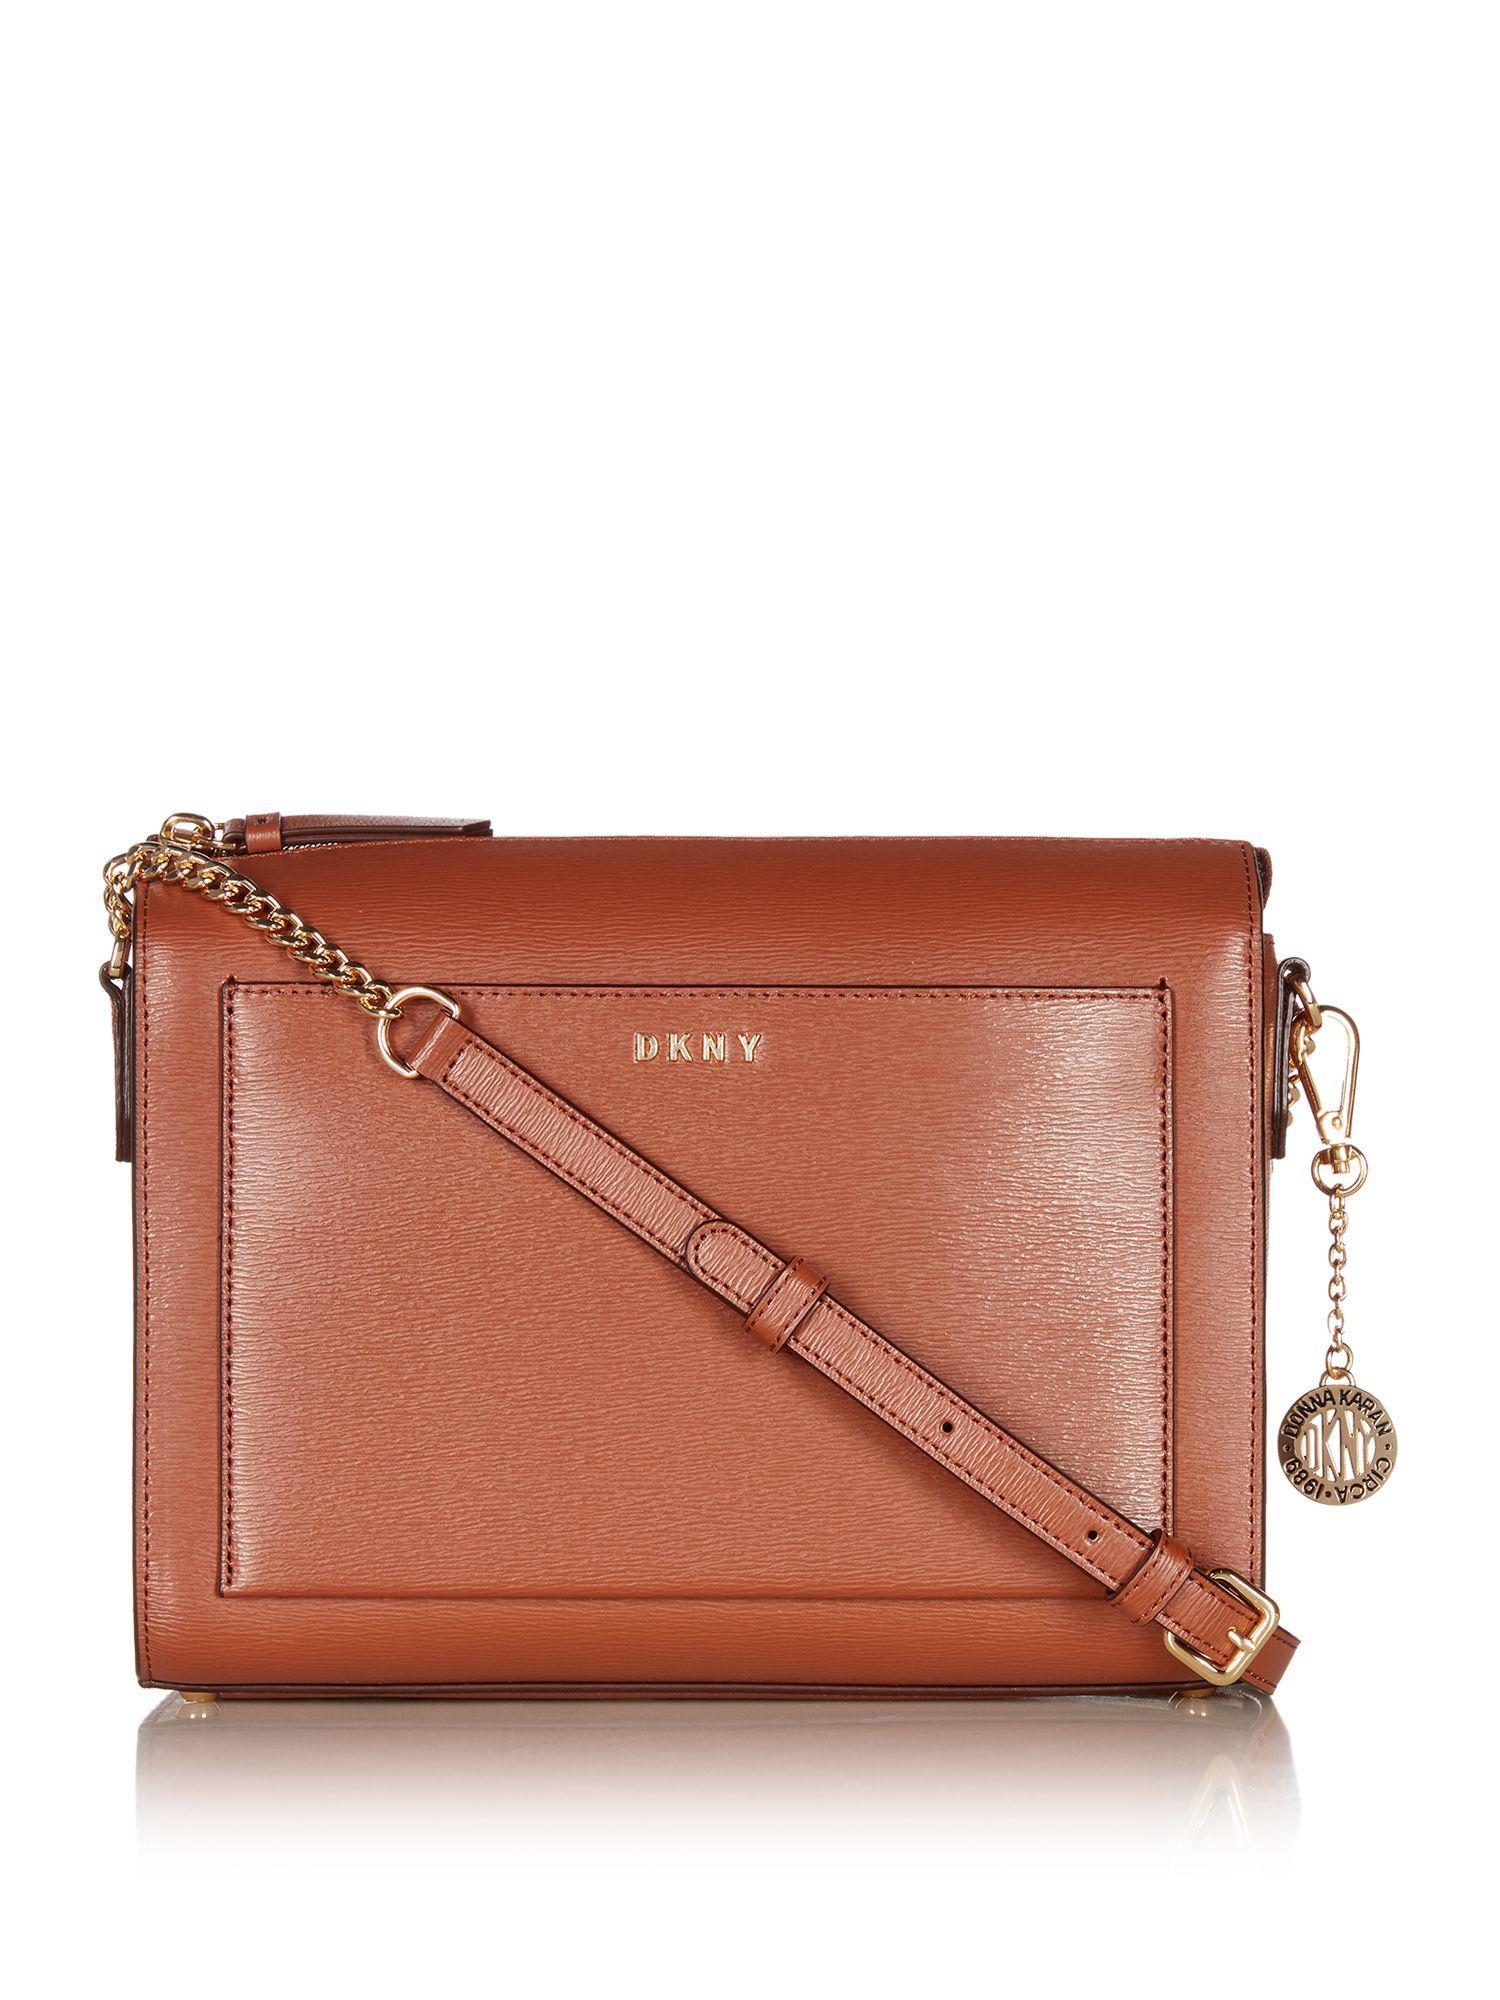 Cross Body Bags - Chain Sutton Bryant SM Demi Crossbody Bag Coral - rose - Cross Body Bags for ladies DKNY ynglA0